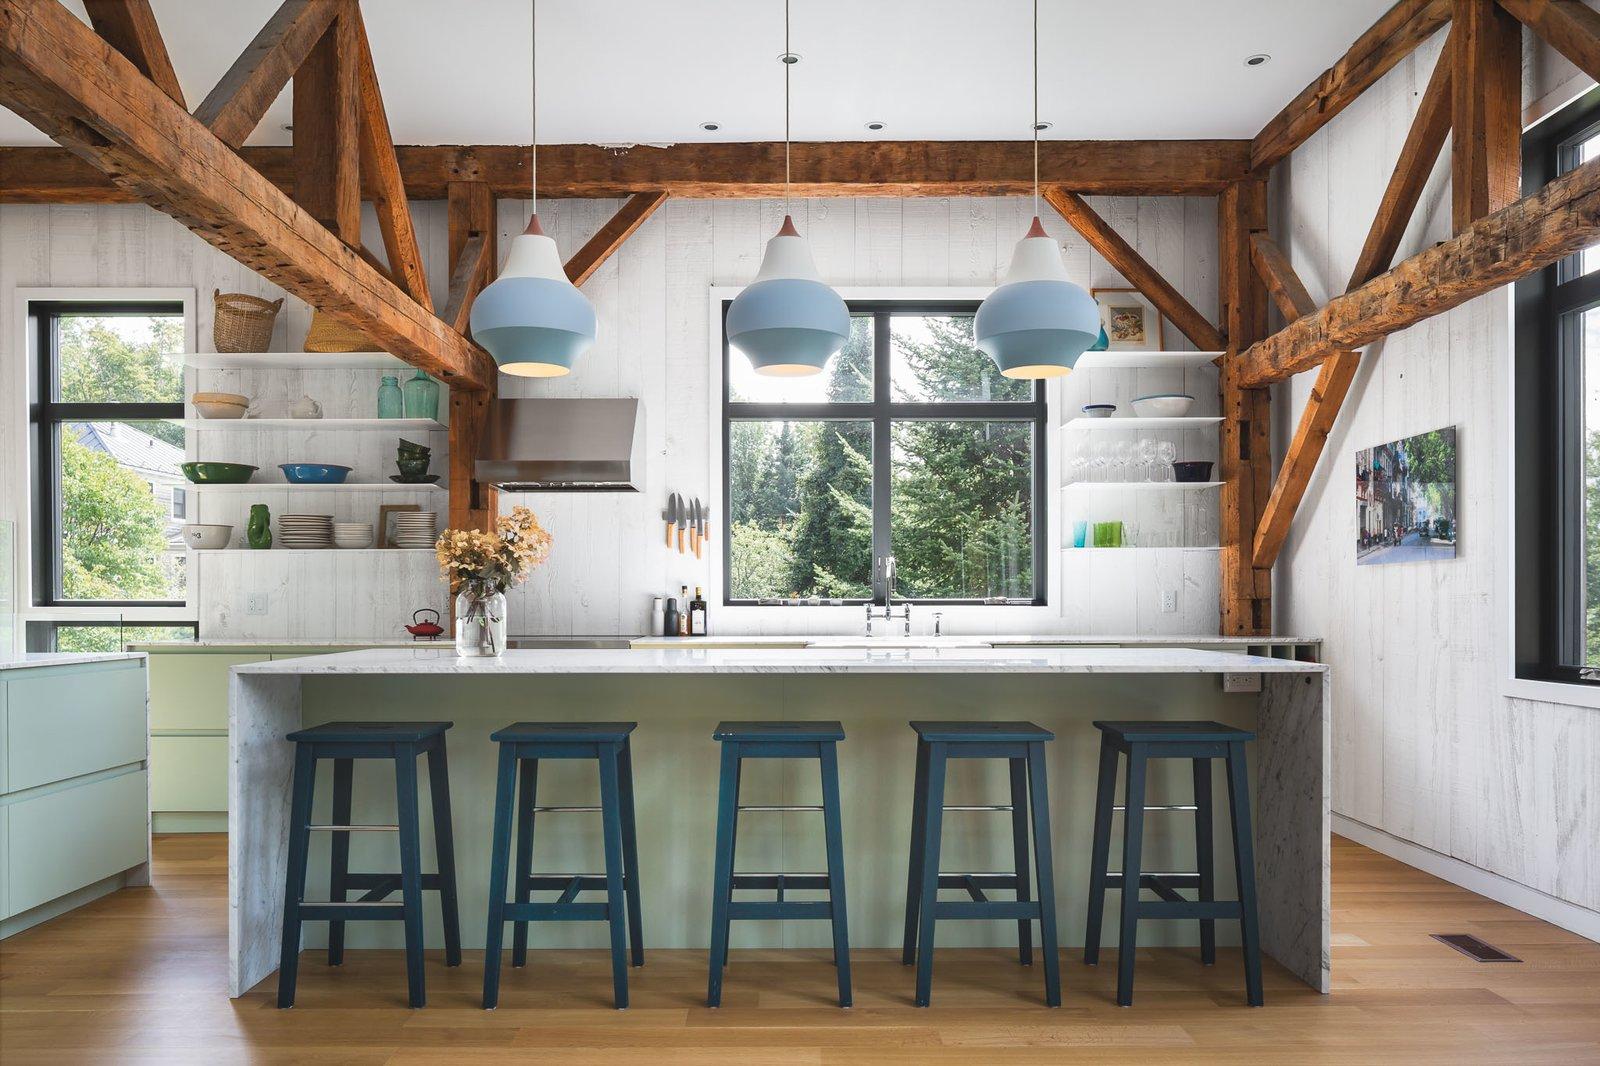 Marble Counter, Pendant Lighting, Cooktops, Range, Vessel Sink, Recessed Lighting, Colorful Cabinet, Wood Backsplashe, Kitchen, and Medium Hardwood Floor  The Barn